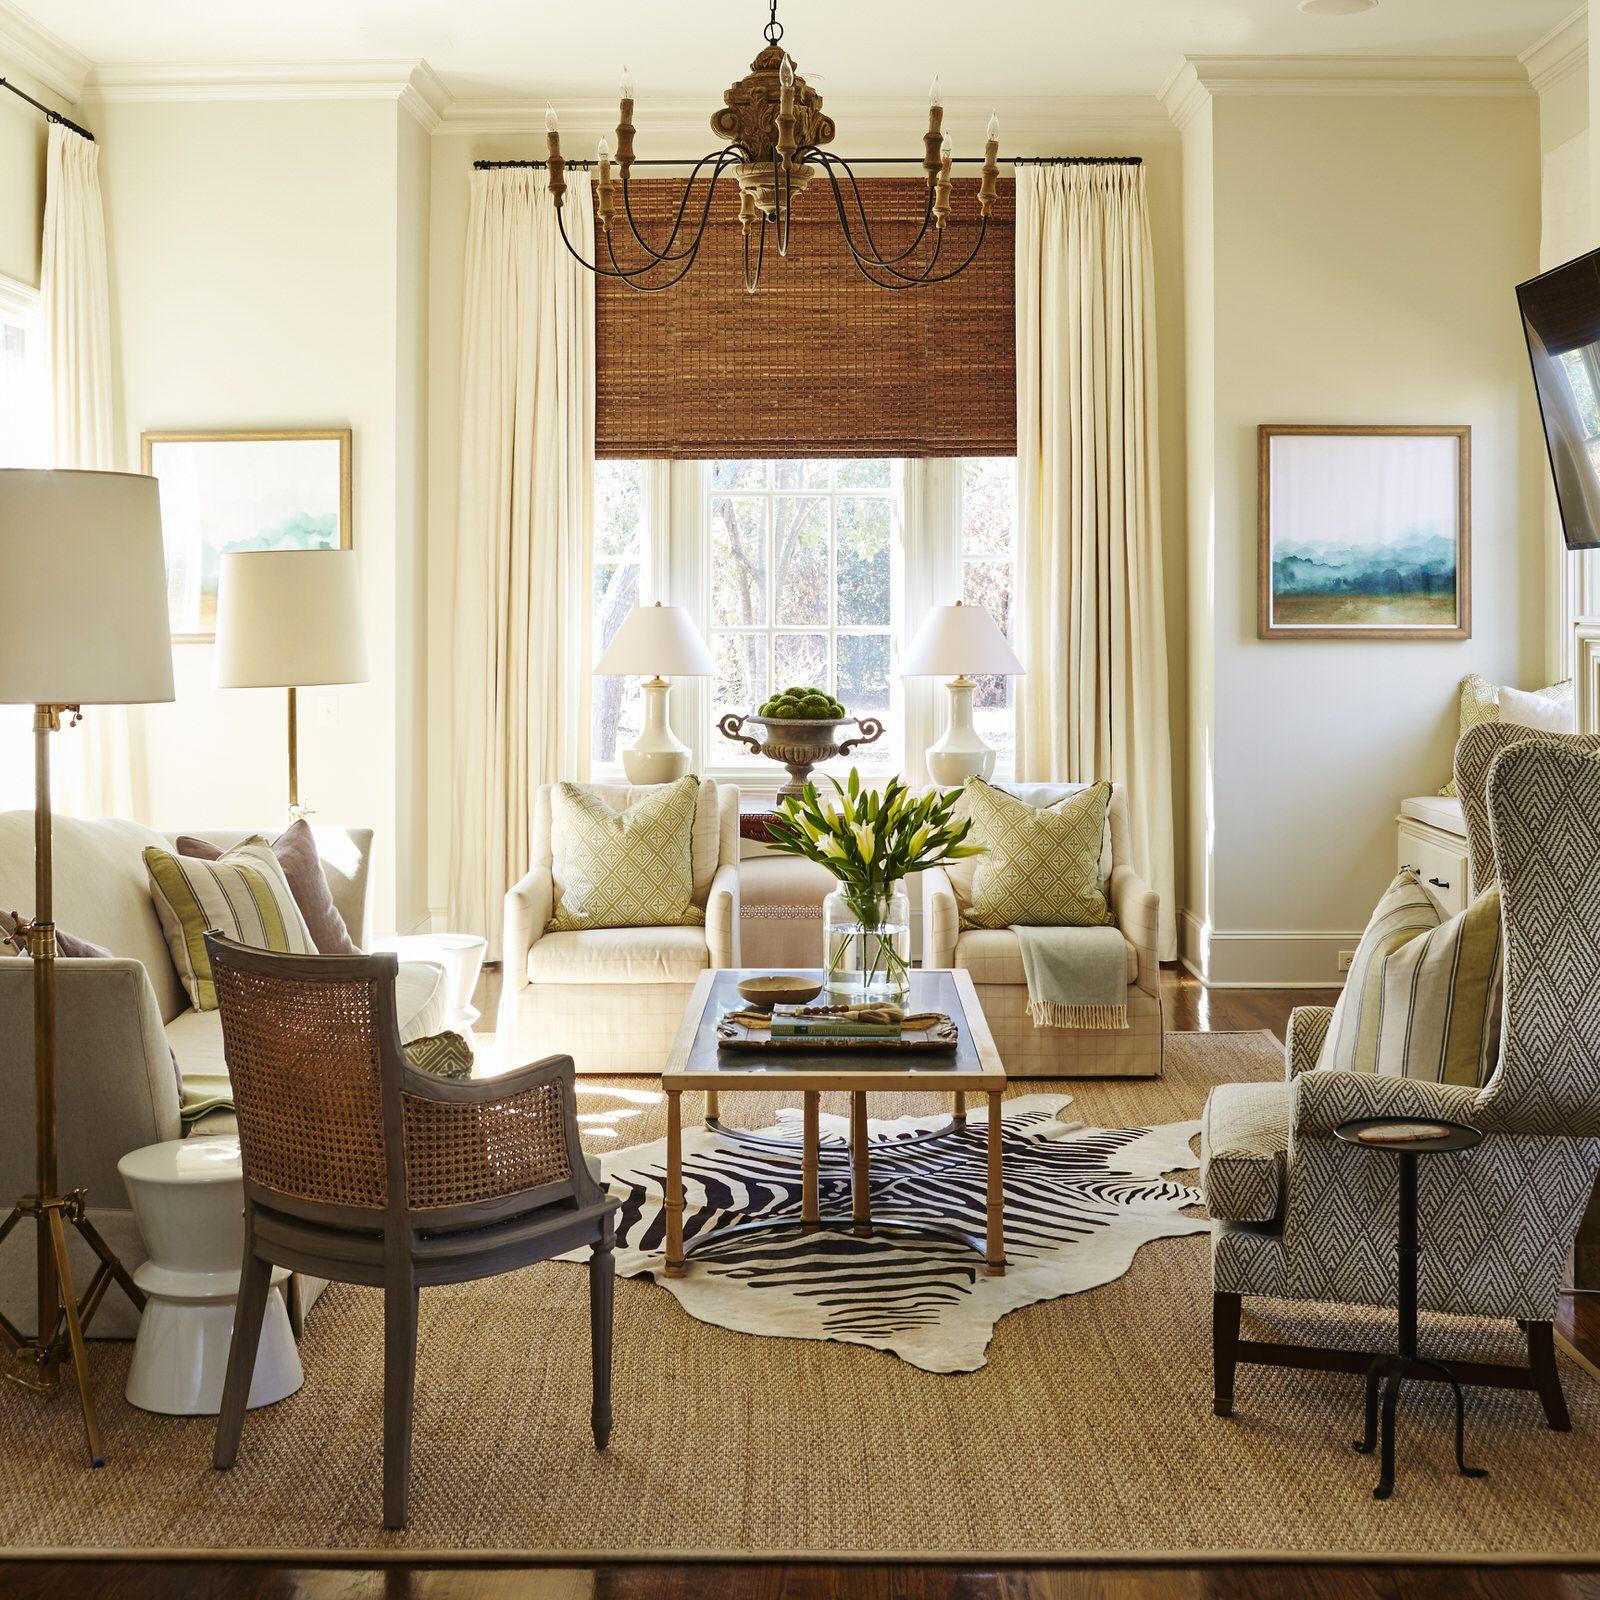 Woodling ashley gilbreath interior design beautiful windows